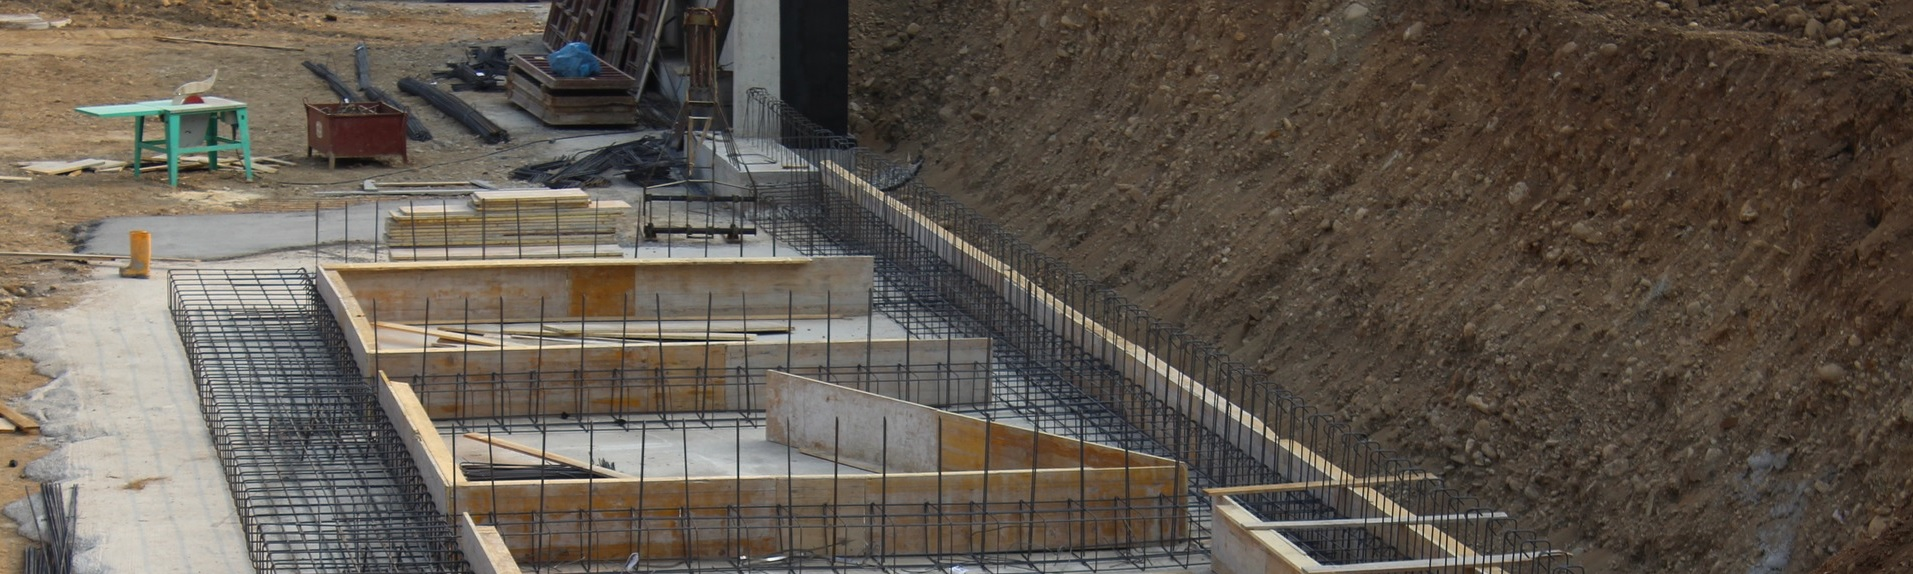 beton fundering